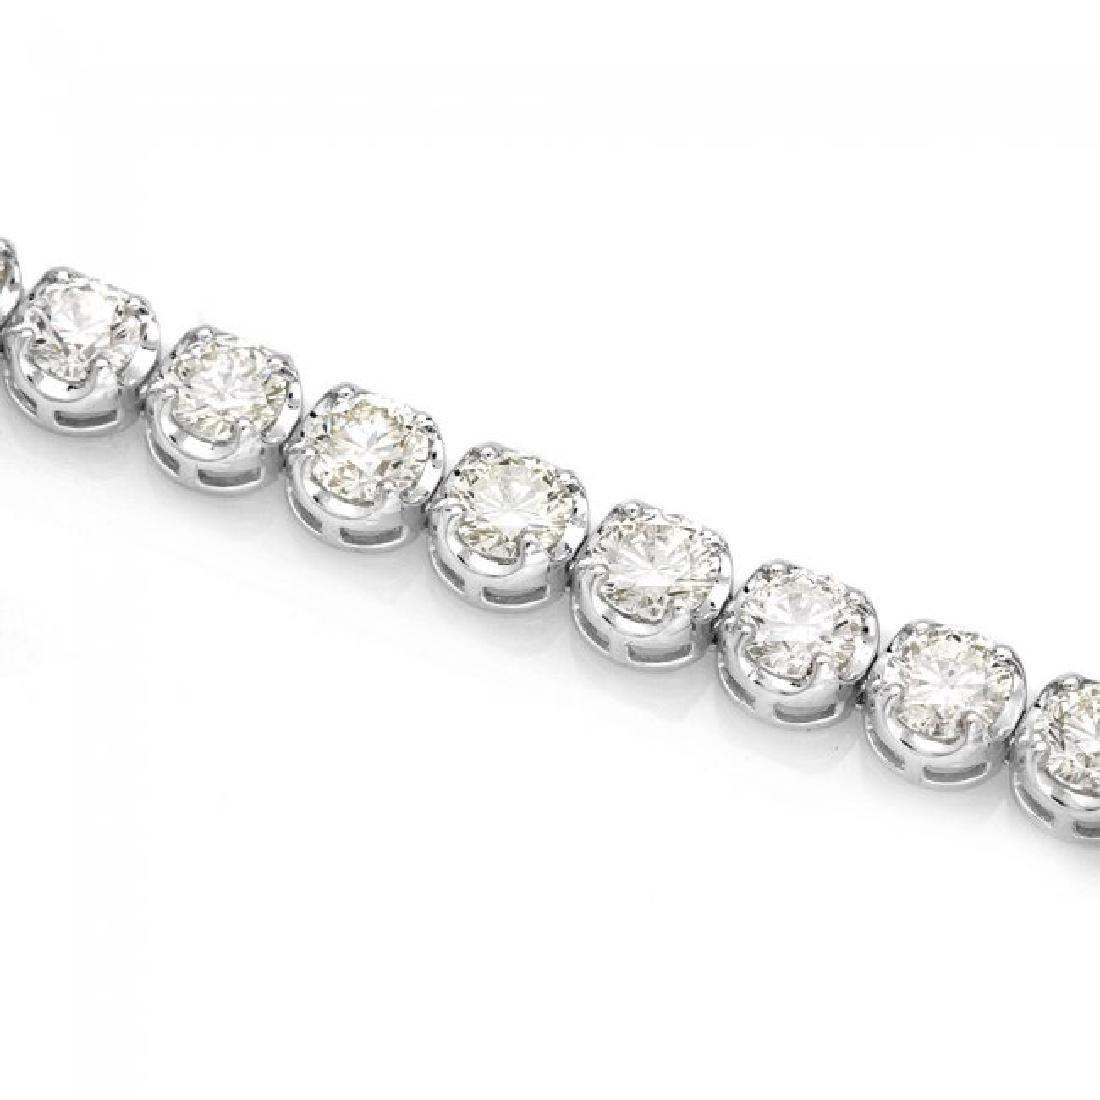 18k White Gold 9.00ct Diamond Tennis Bracelet - 3